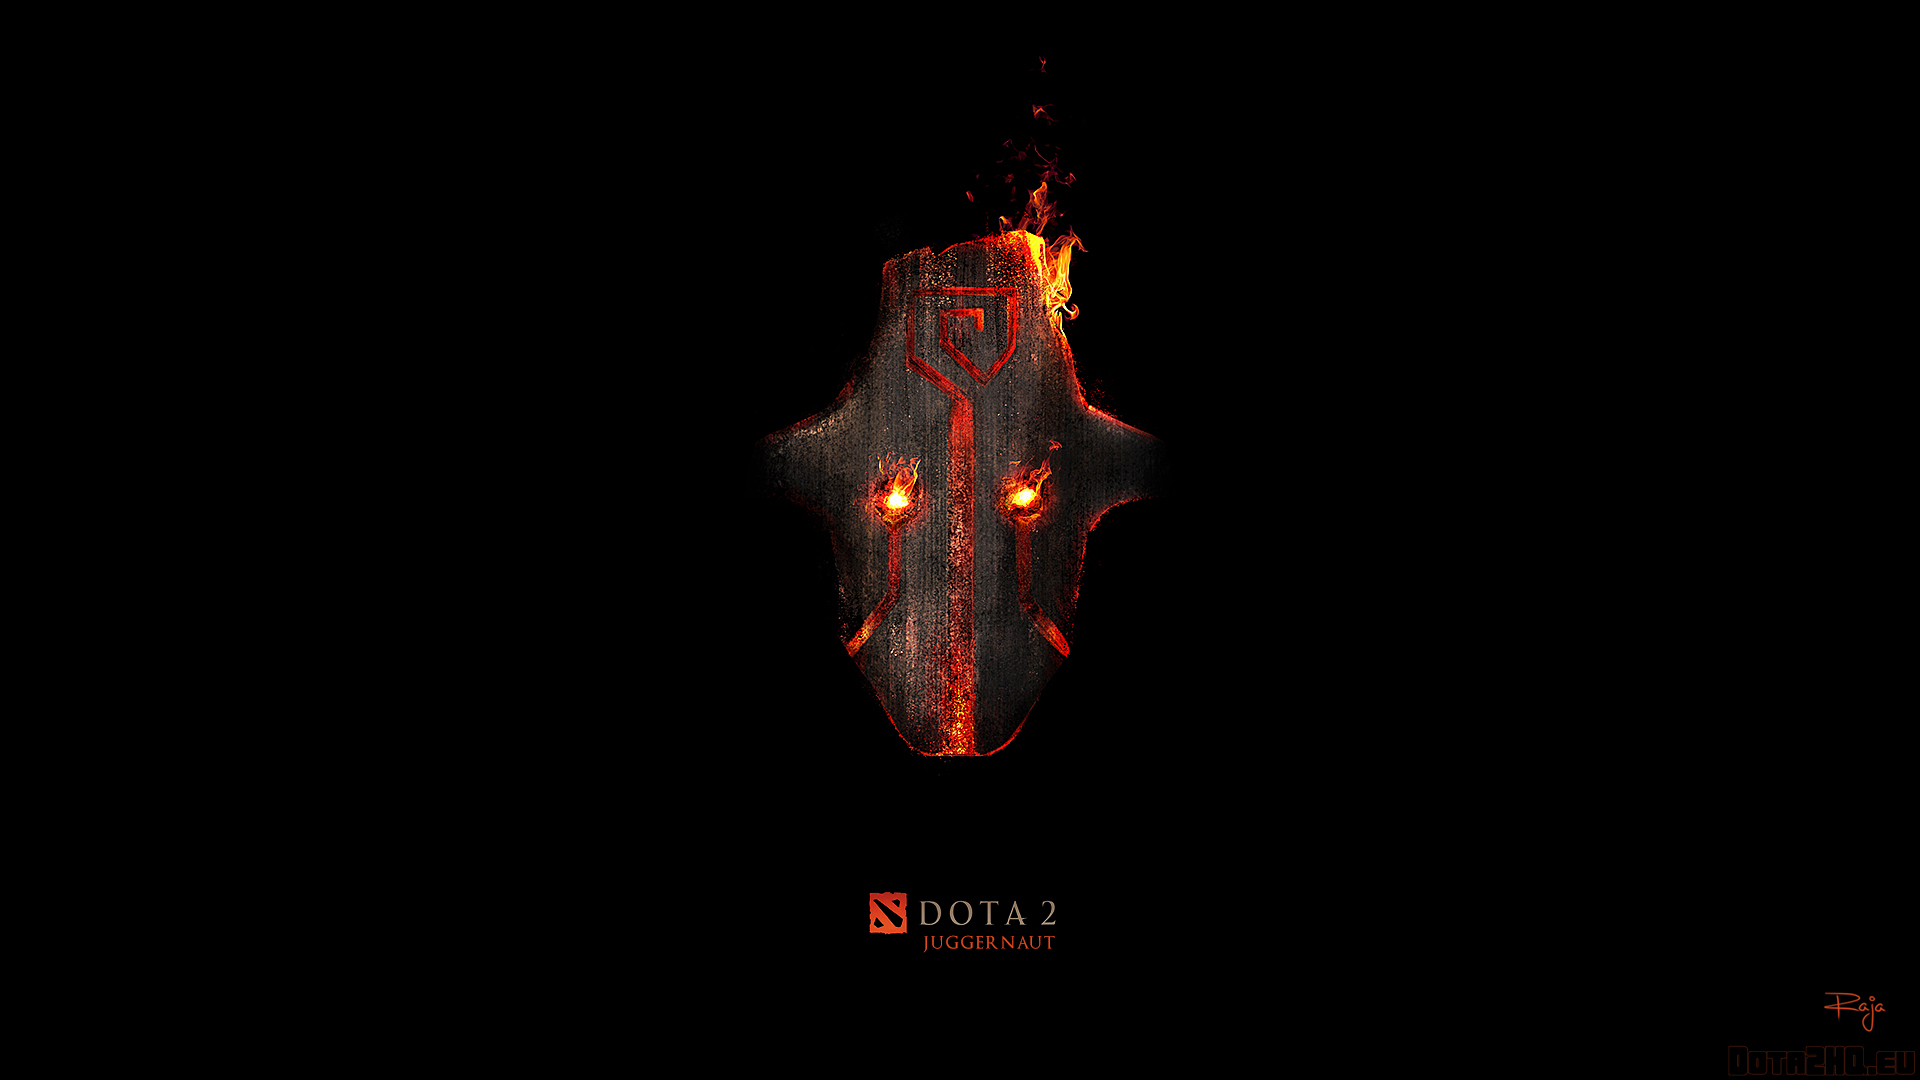 Mask Dota 2 Logo Wallpaper Hd Games 4k Wallpapers Images